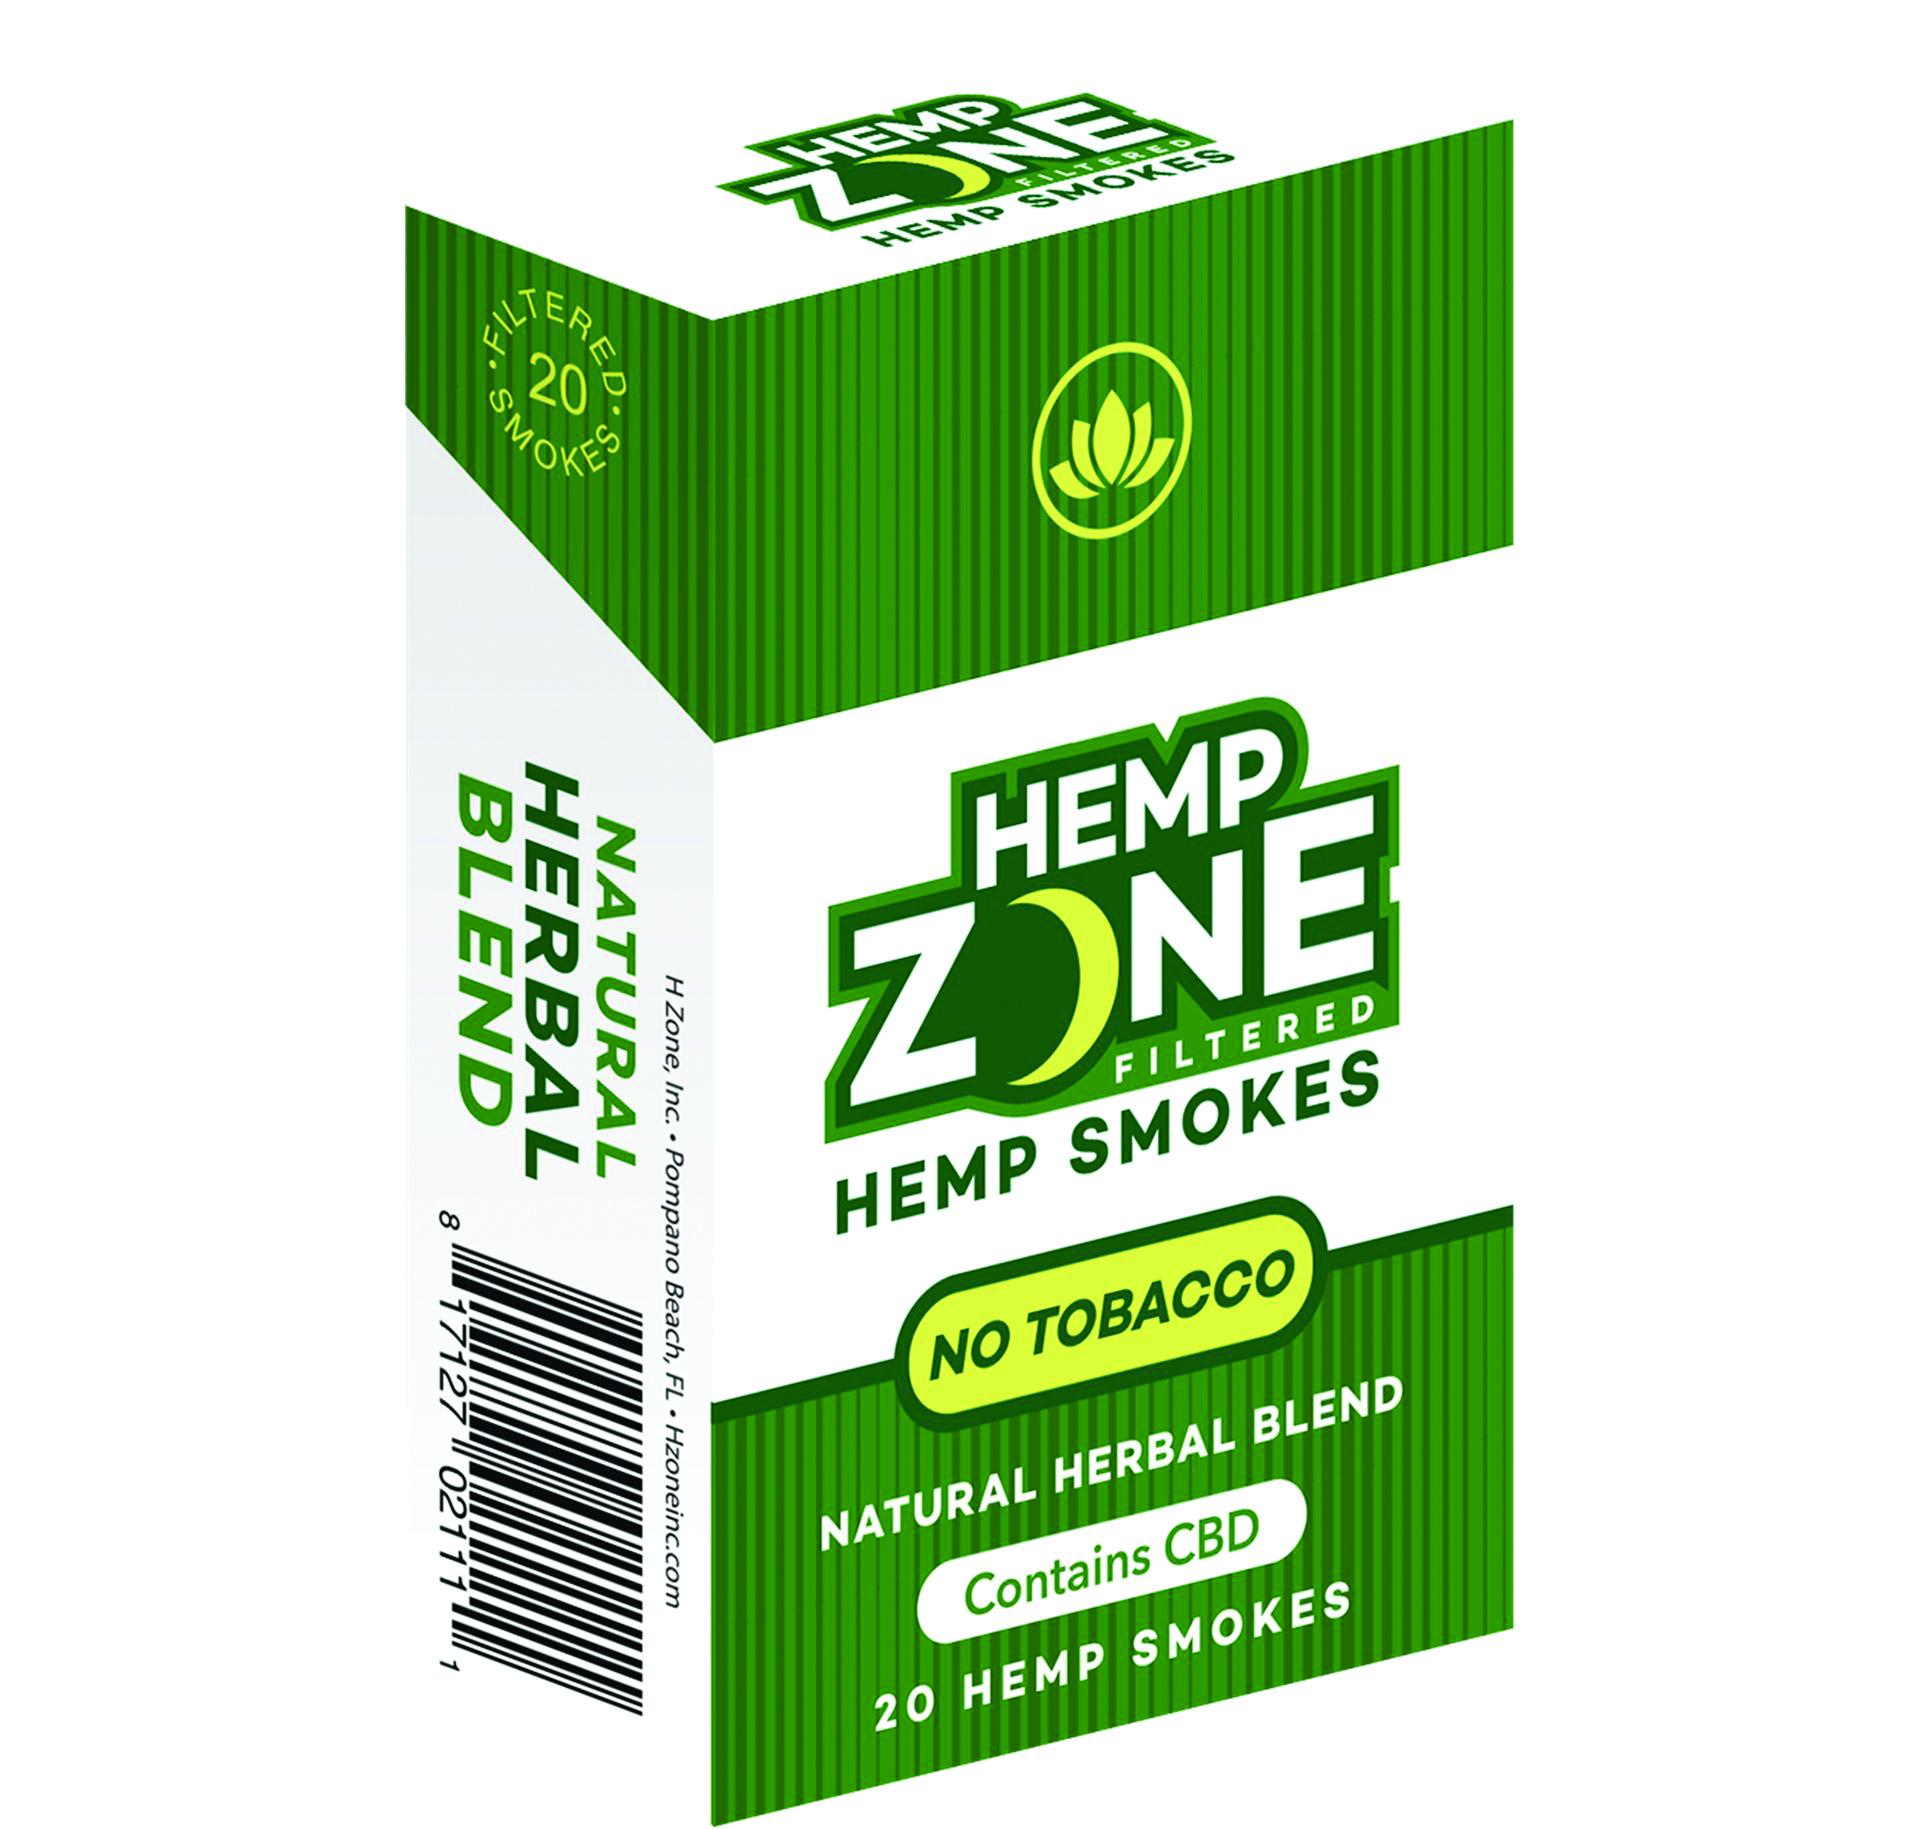 Edibles Magazine Reviews Hemp Zone Filtered Smokes